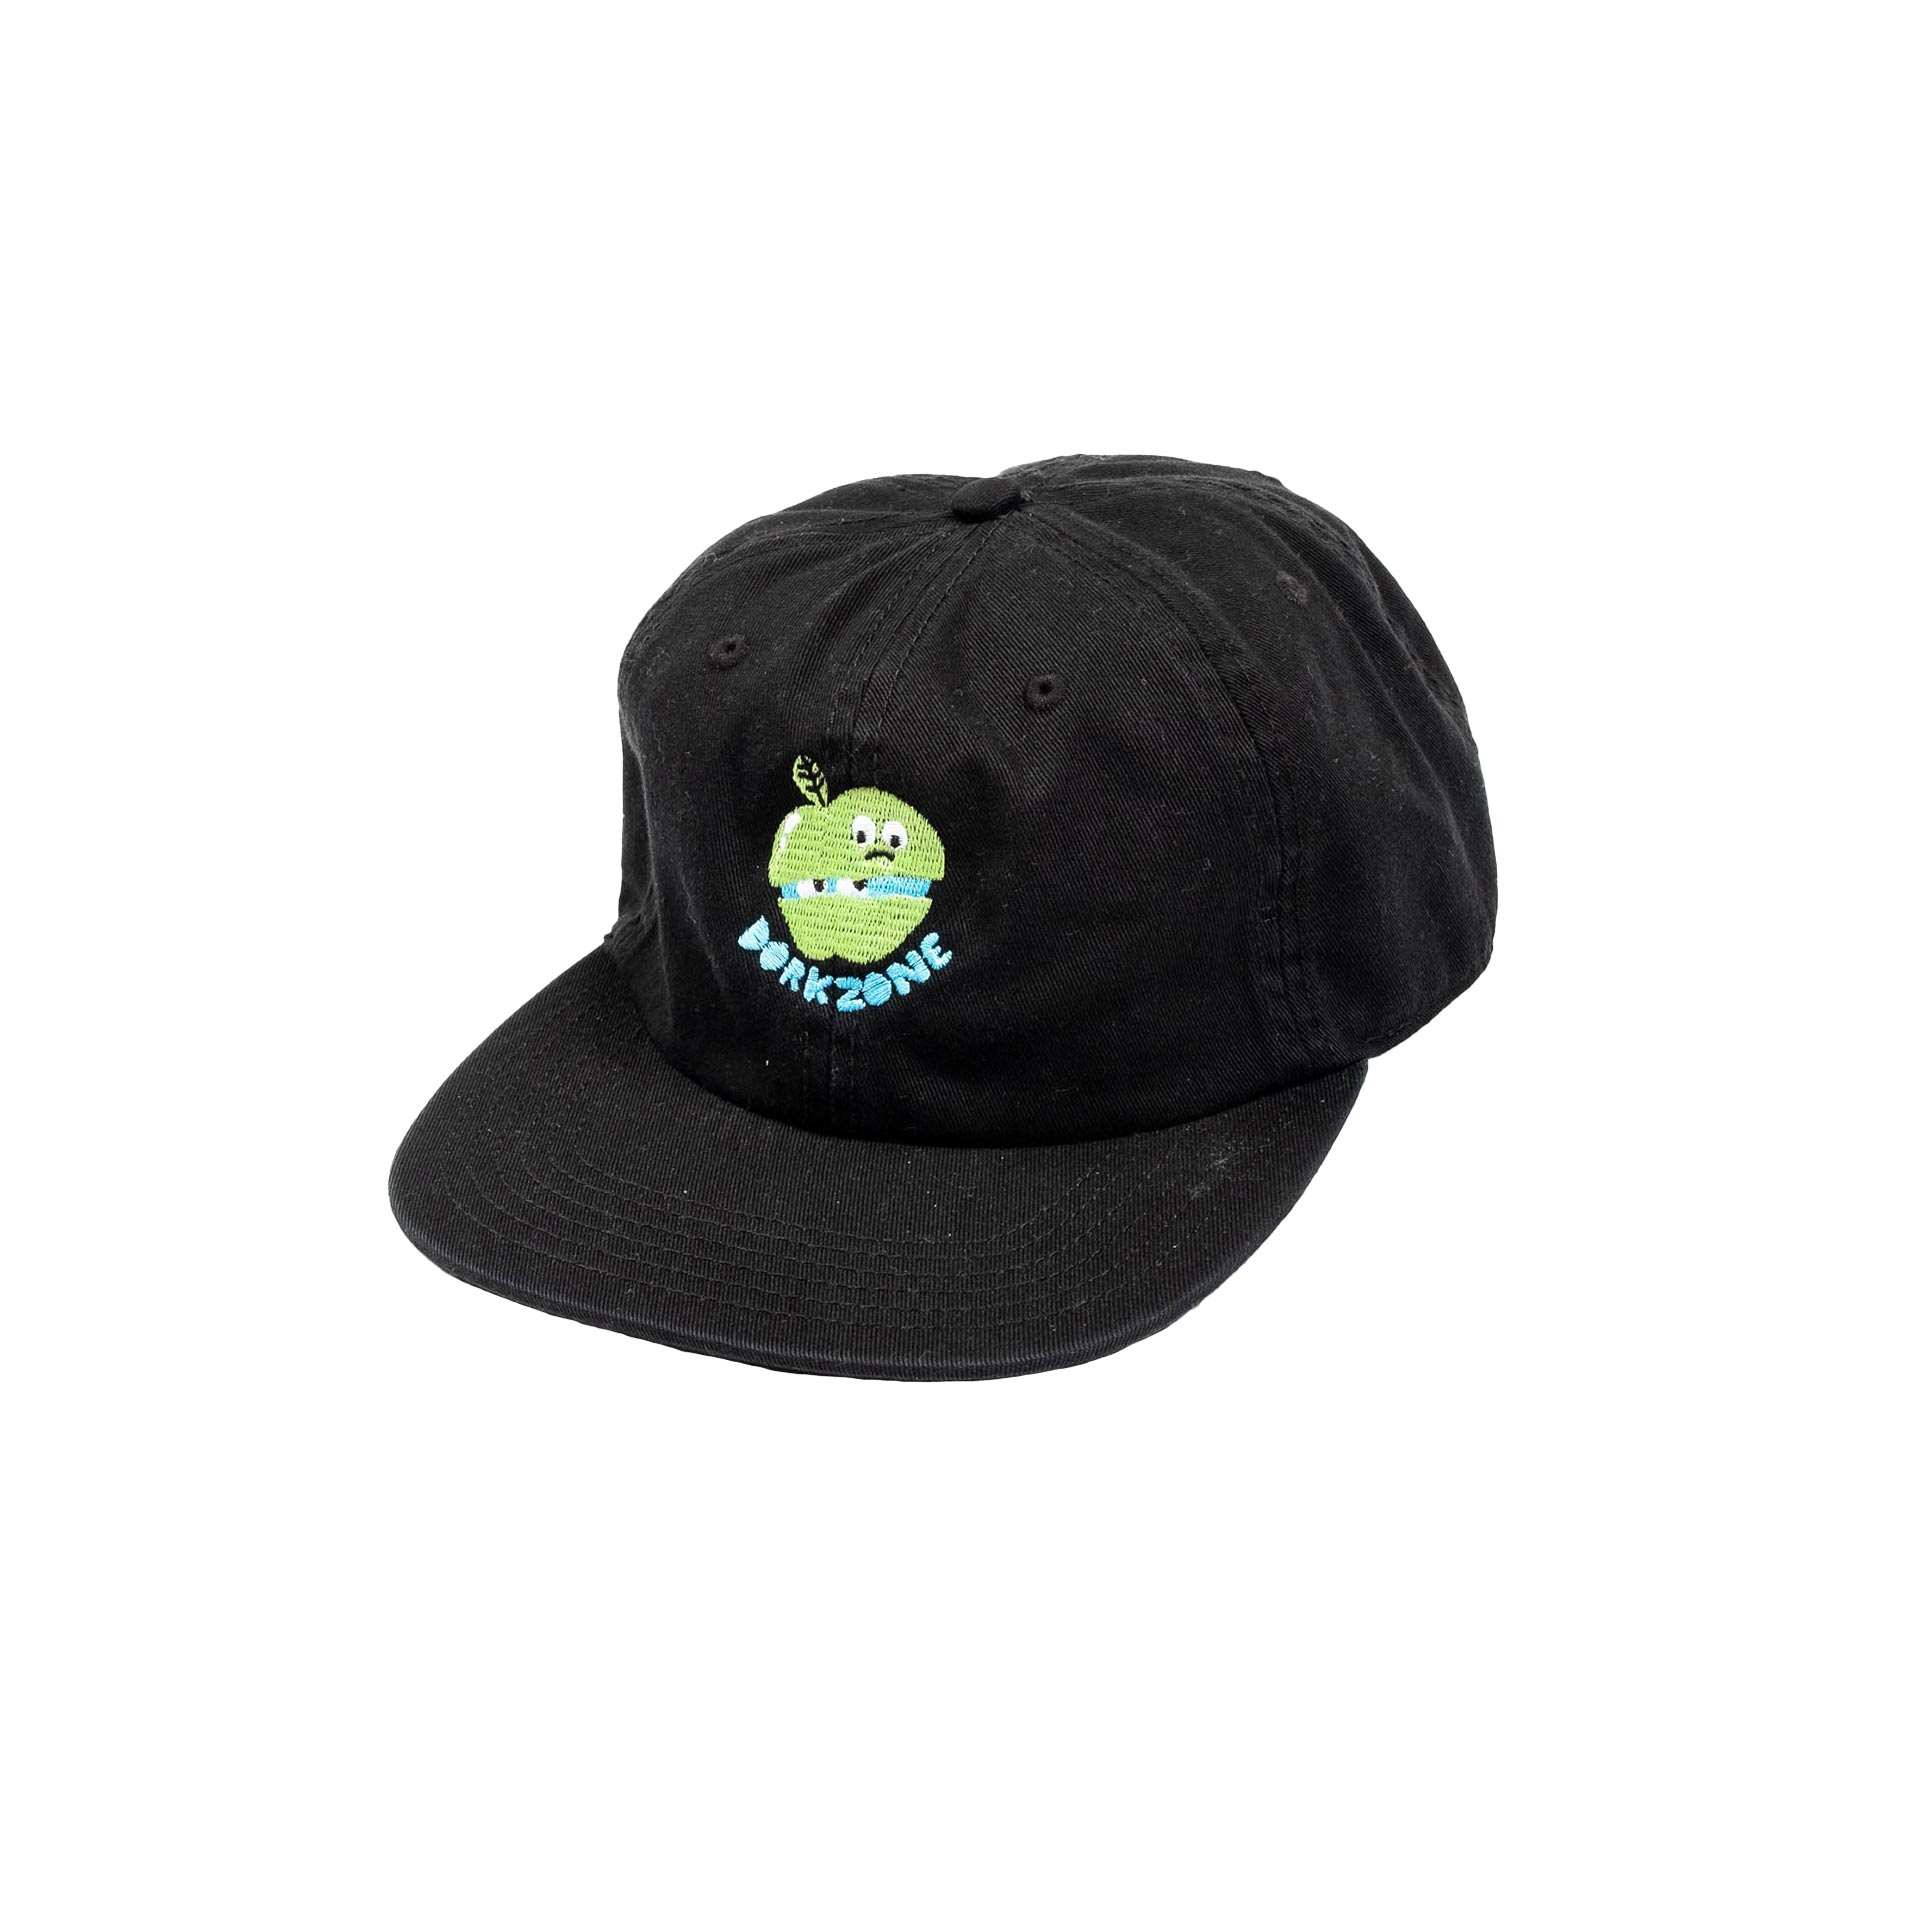 Dorkzone Embroided Apple Cap Black